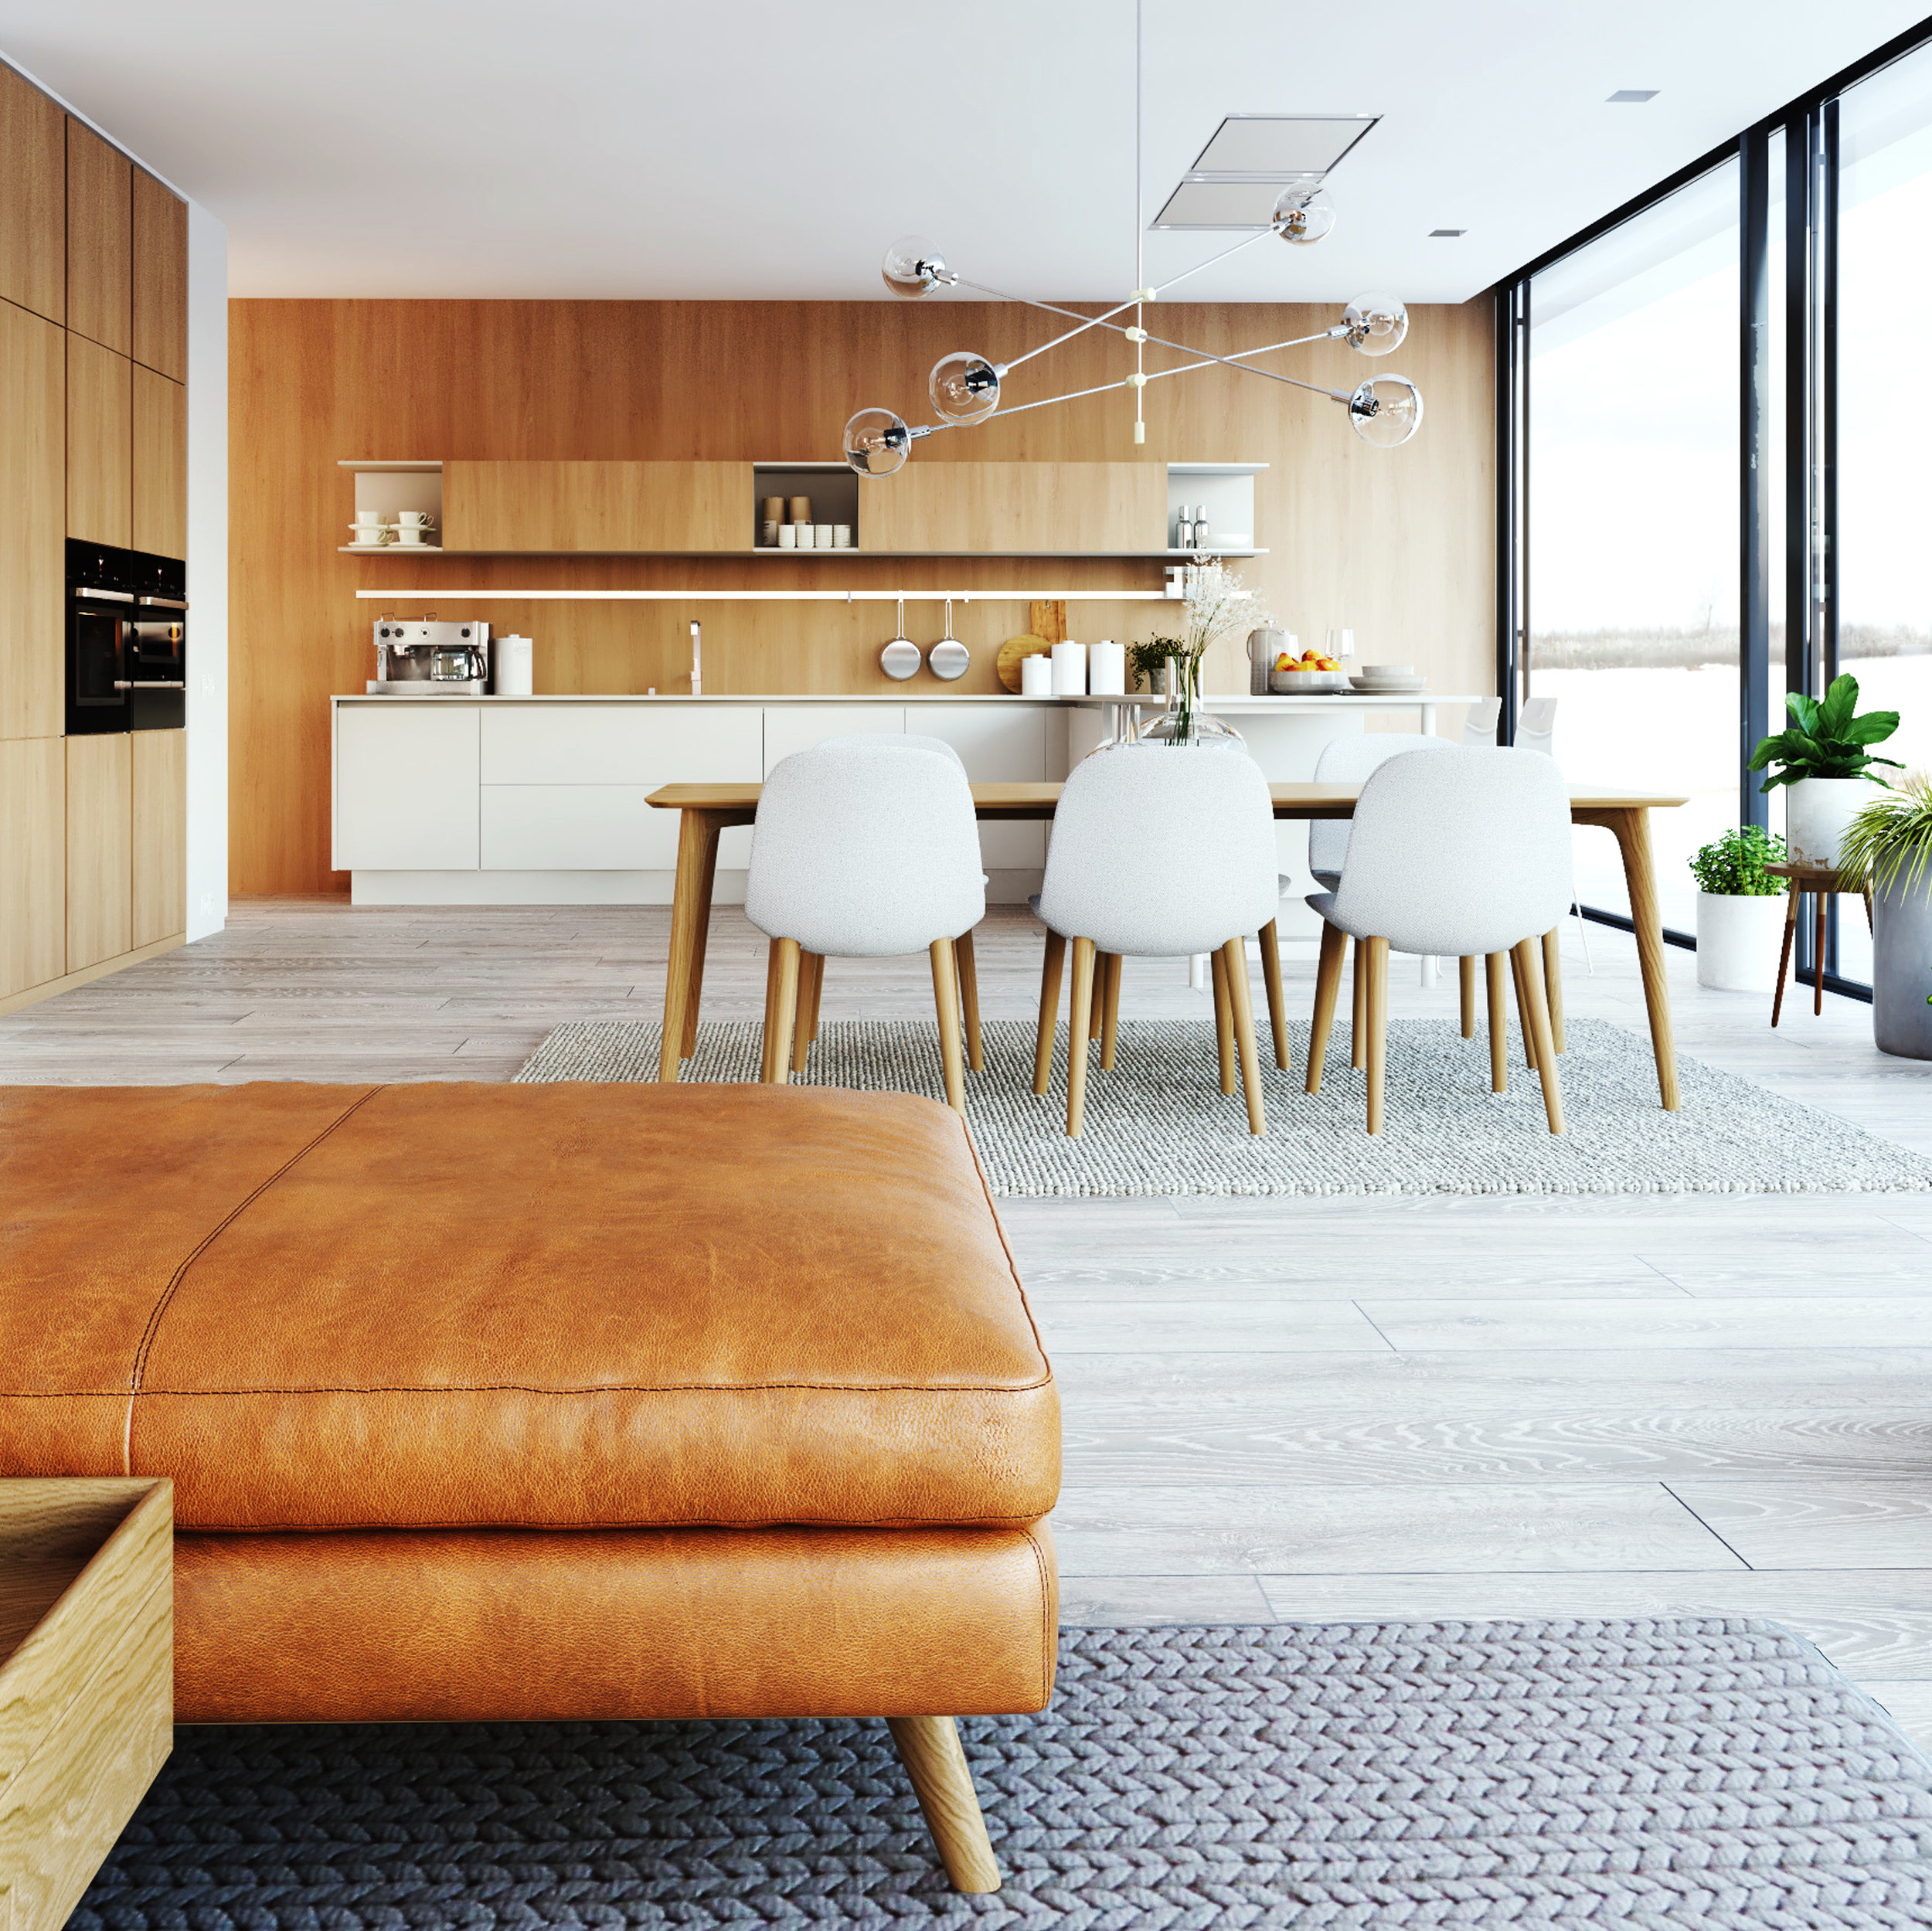 catherine-schellenberg-real-estate-team-winnipeg-realtor-mark-wiebe-re:max-professionals-current-market-listings.jpg